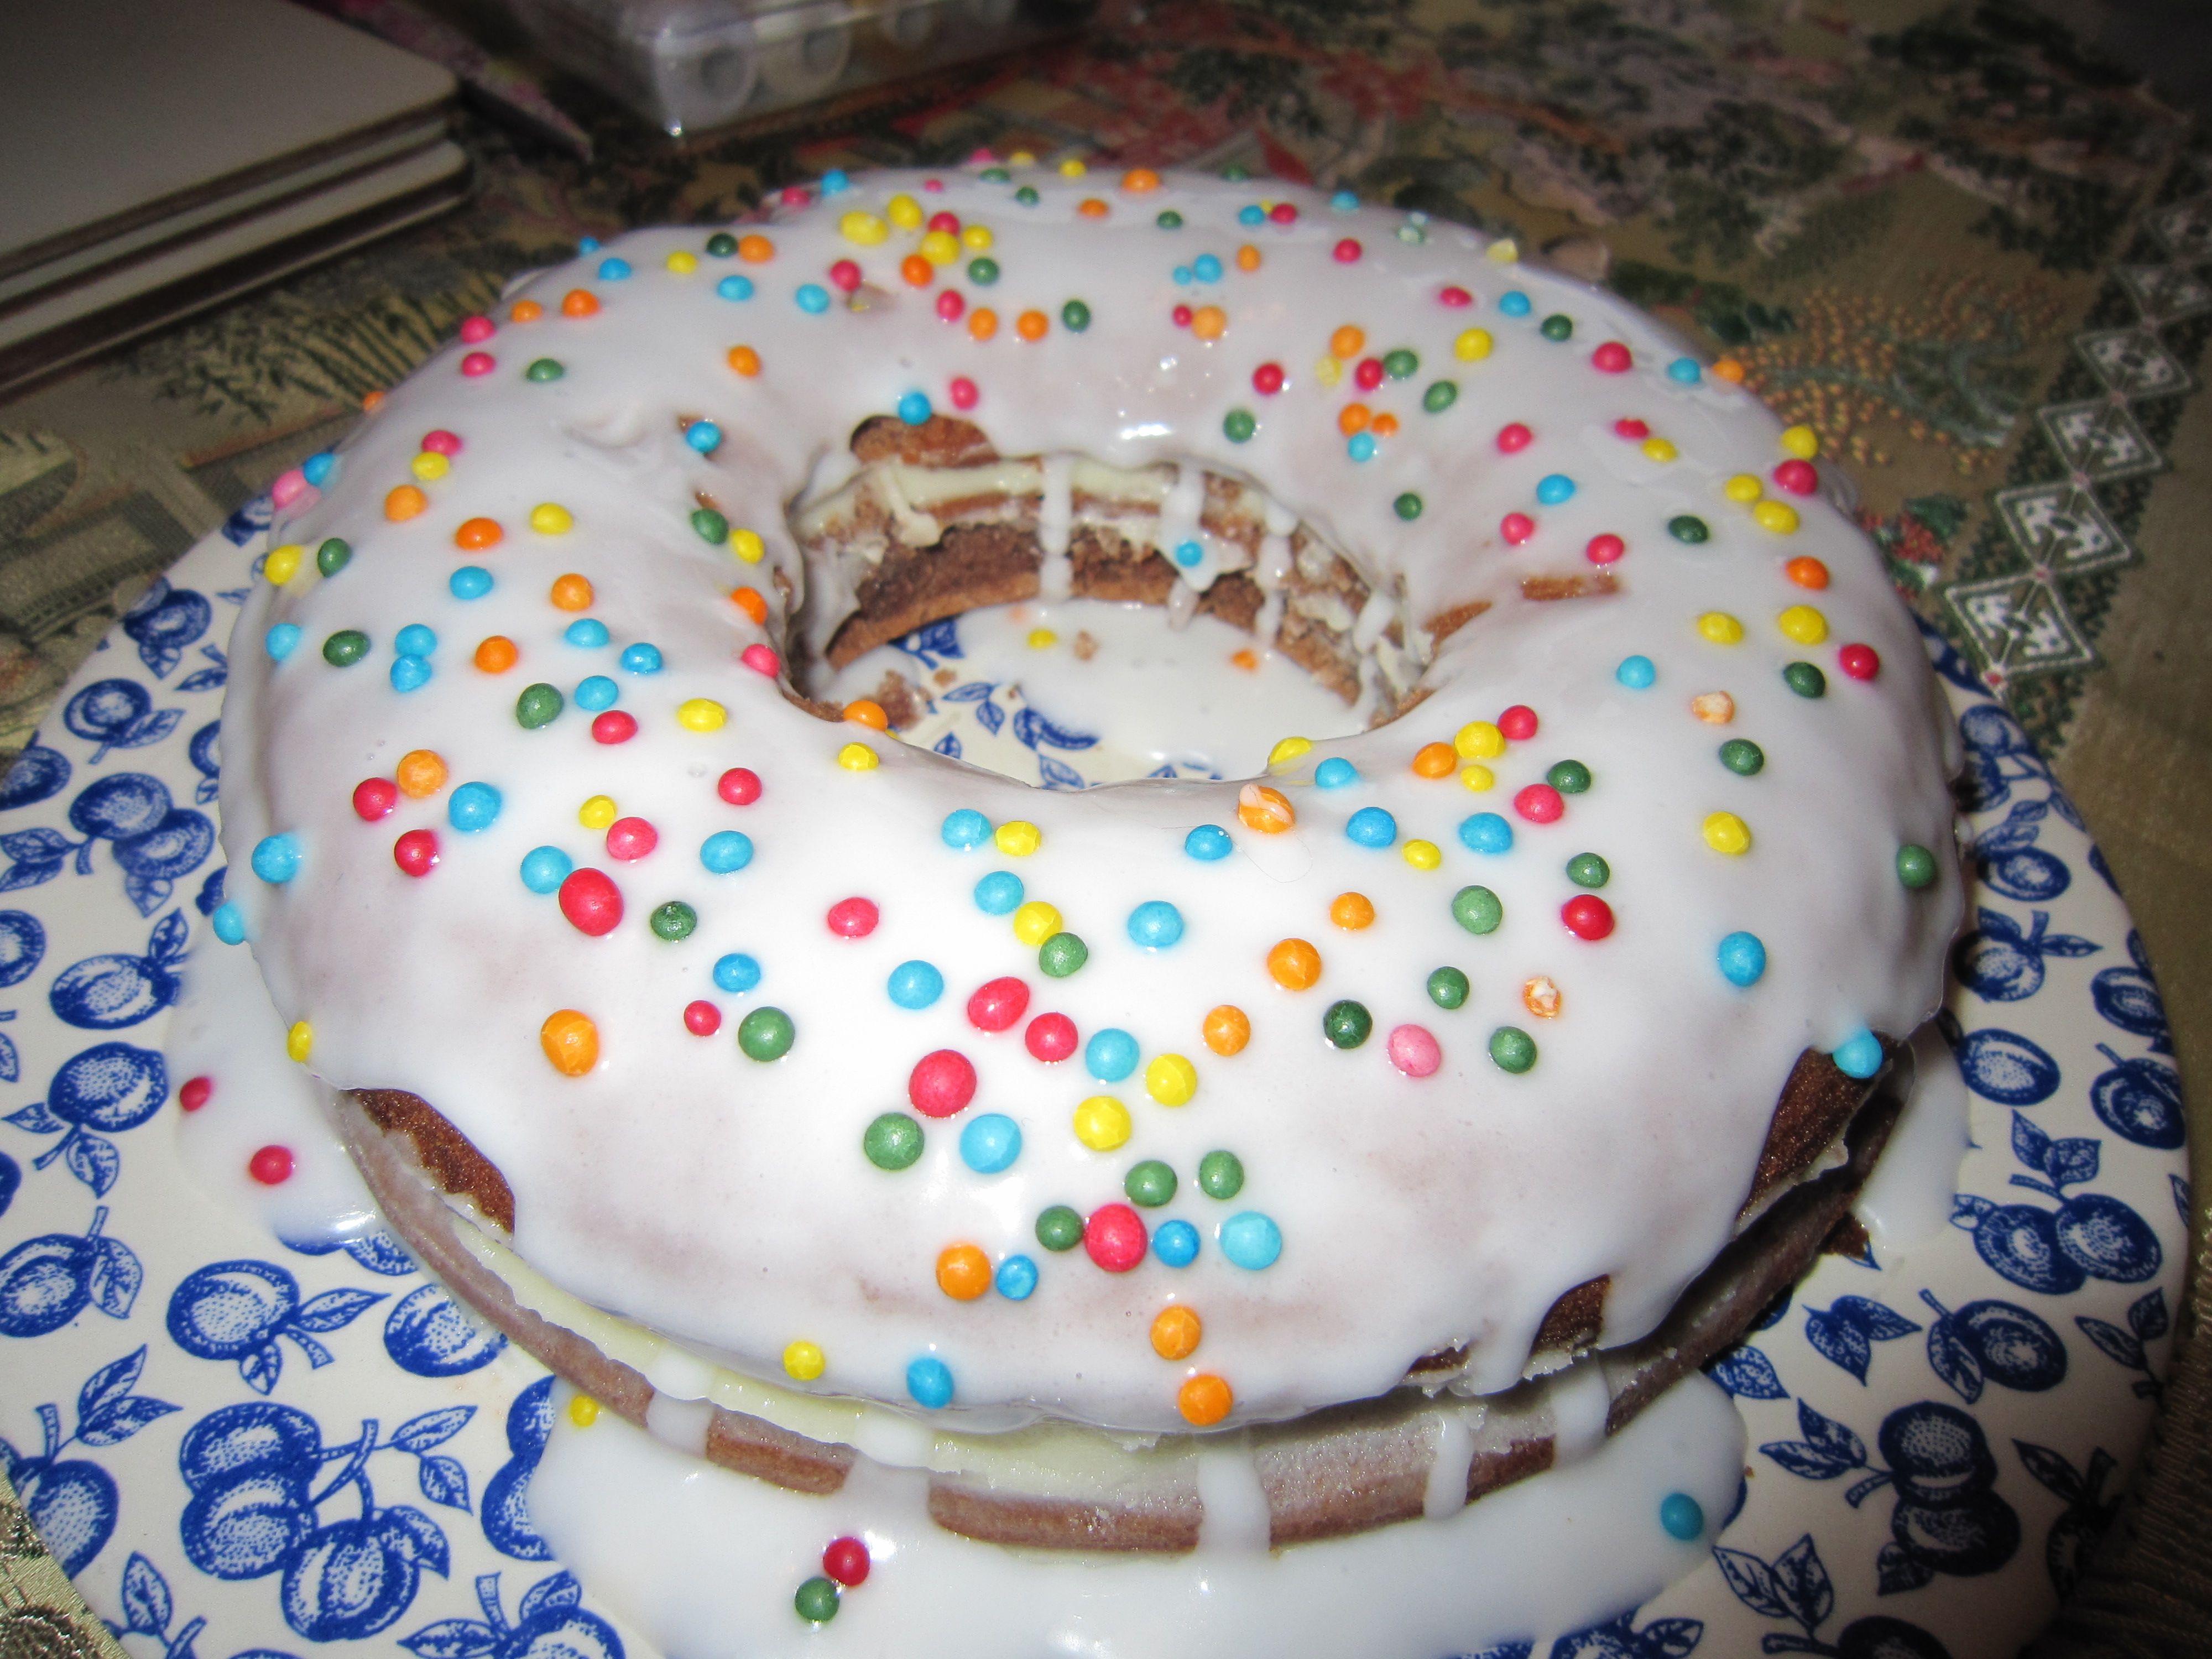 Giant Doughnut Shaped Cake Use Bundy Or Round Pans